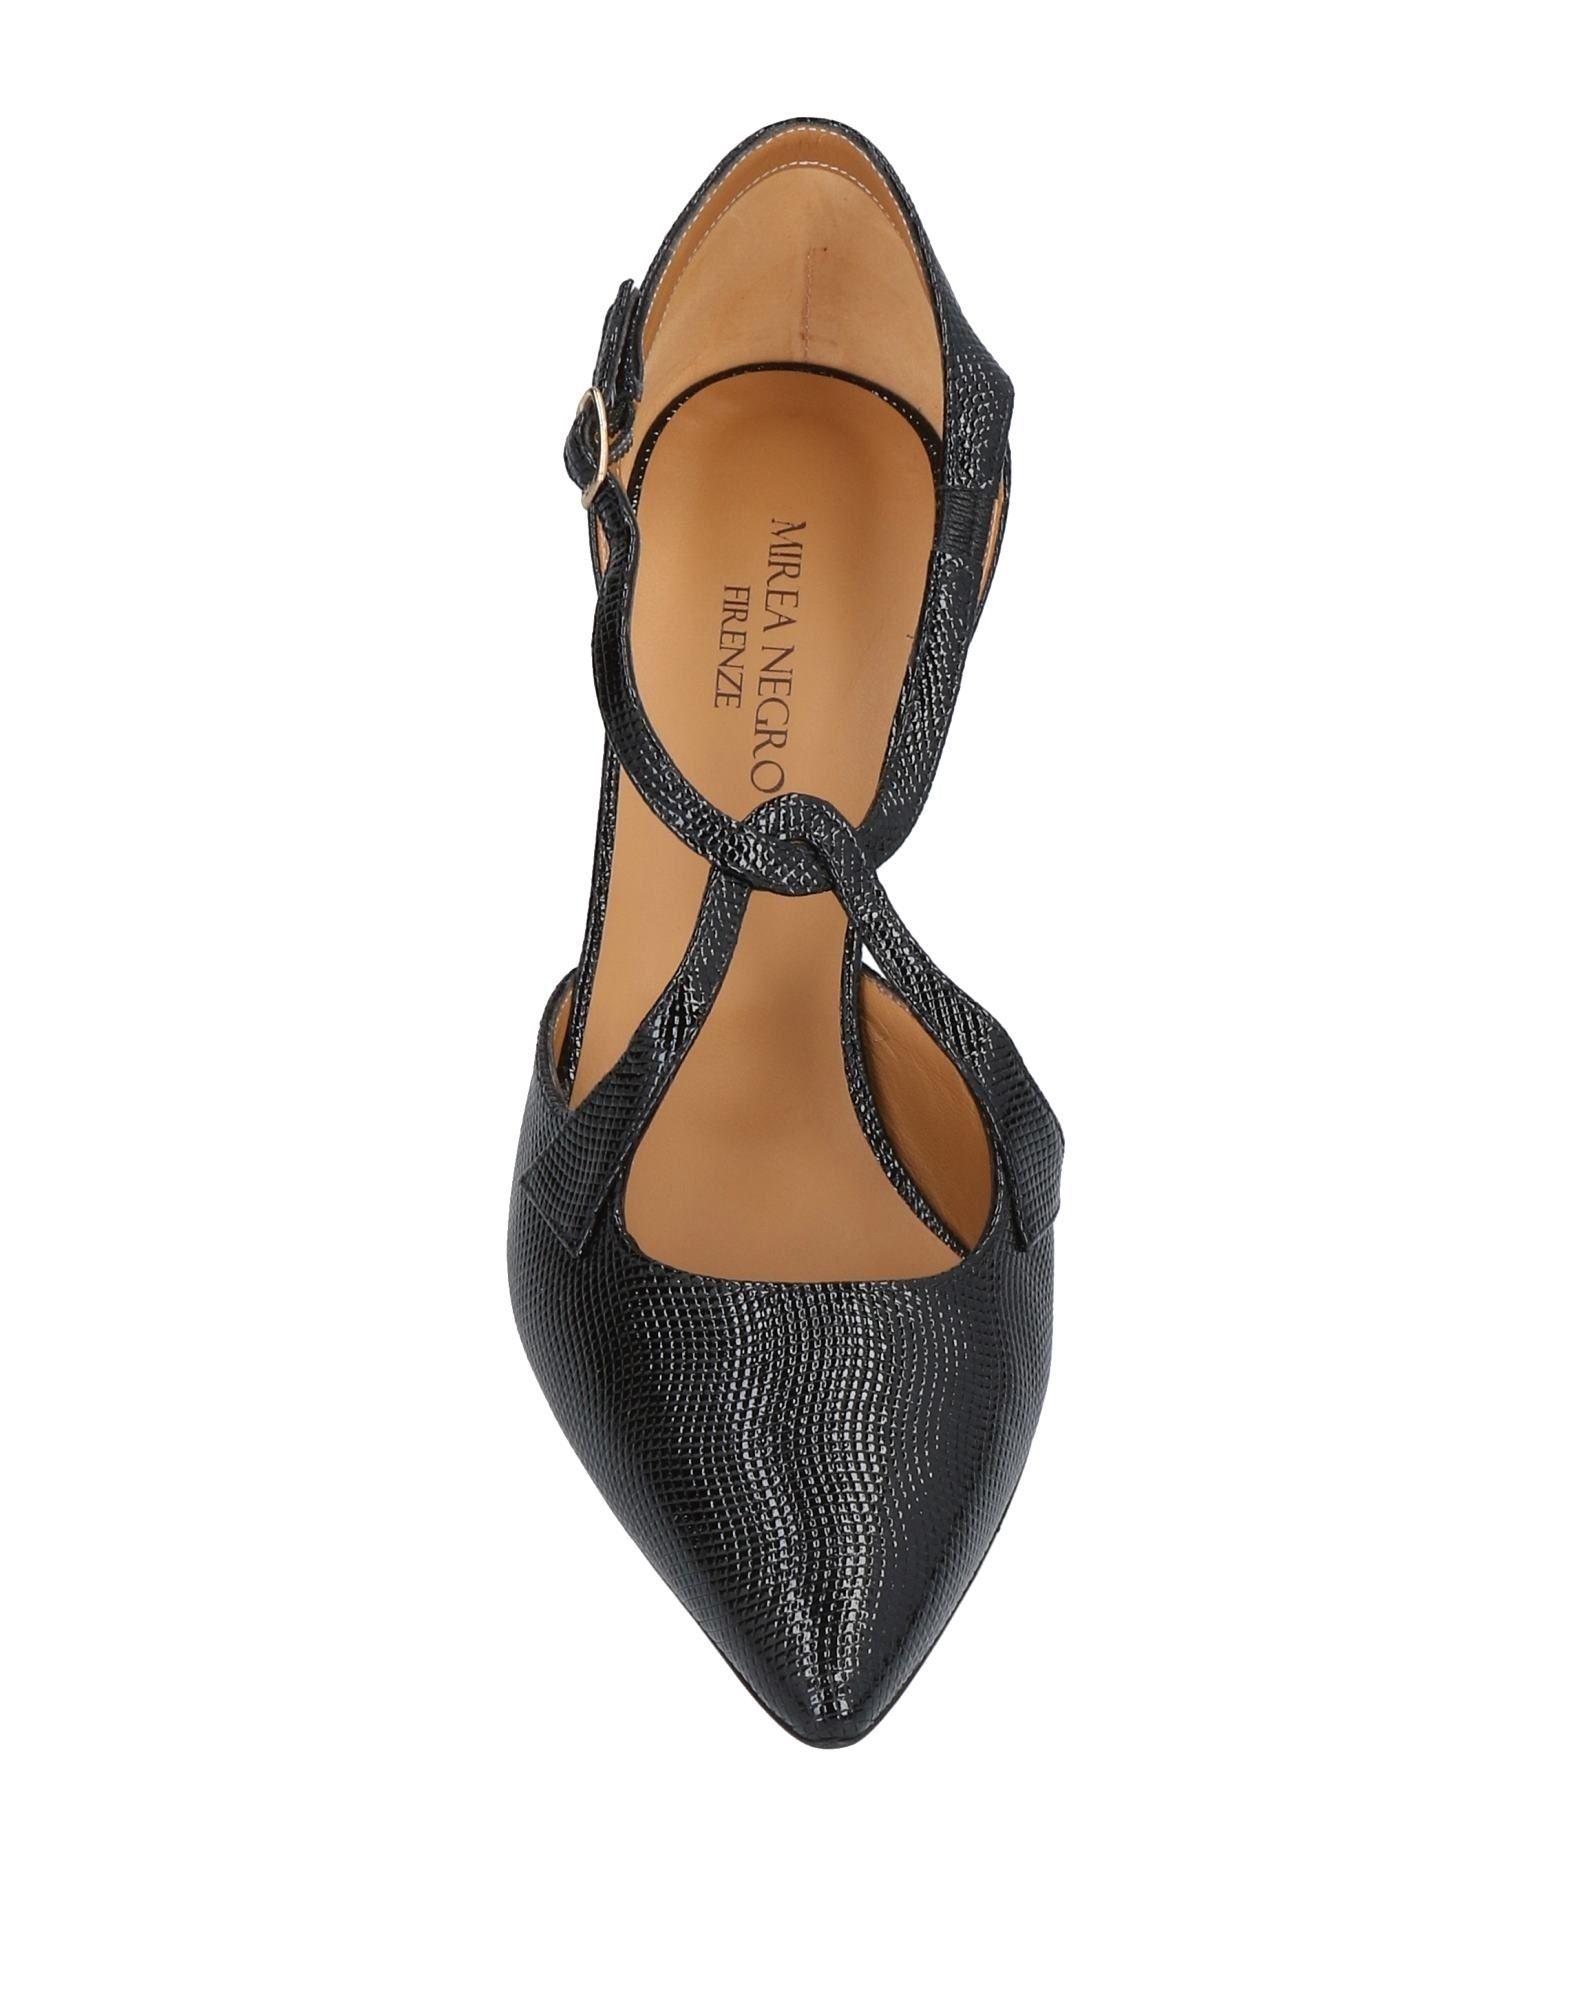 Stilvolle billige Schuhe  Mirea Negro Pumps Damen  Schuhe 11485617WM 6232c5